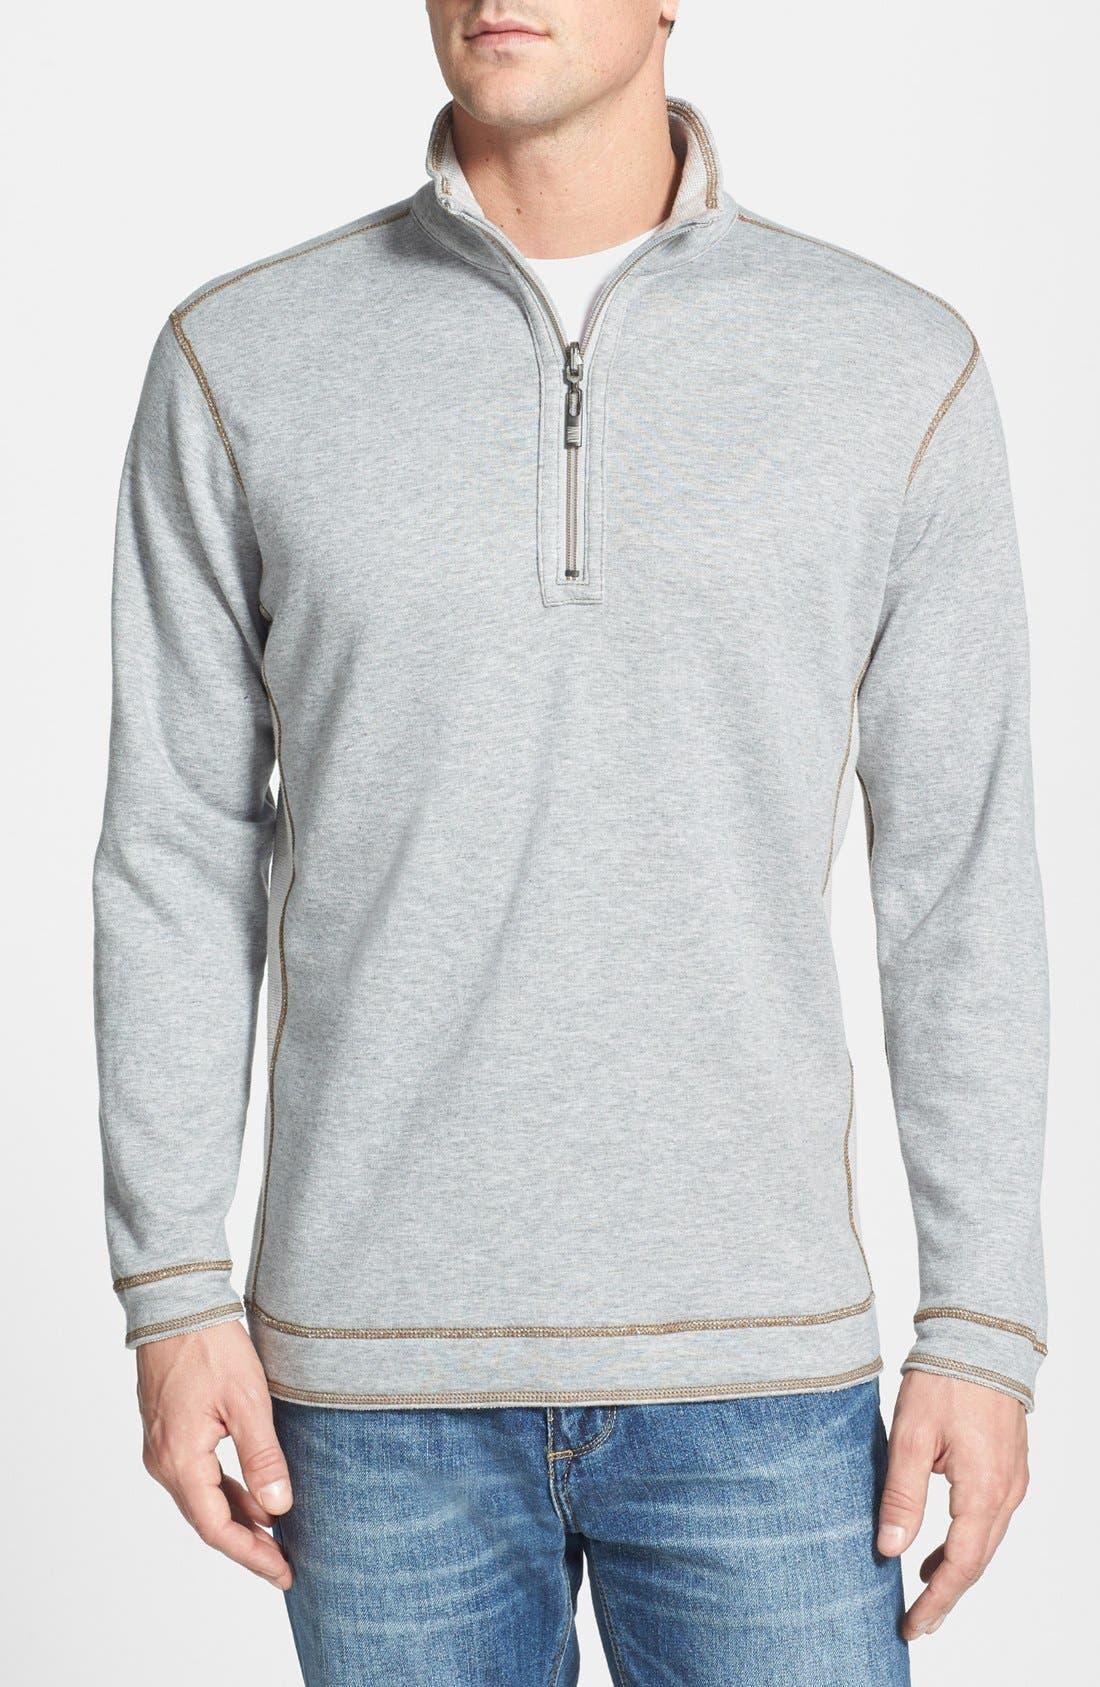 Alternate Image 2  - Tommy Bahama Denim 'Grand Isles' Reversible Half Zip Sweatshirt